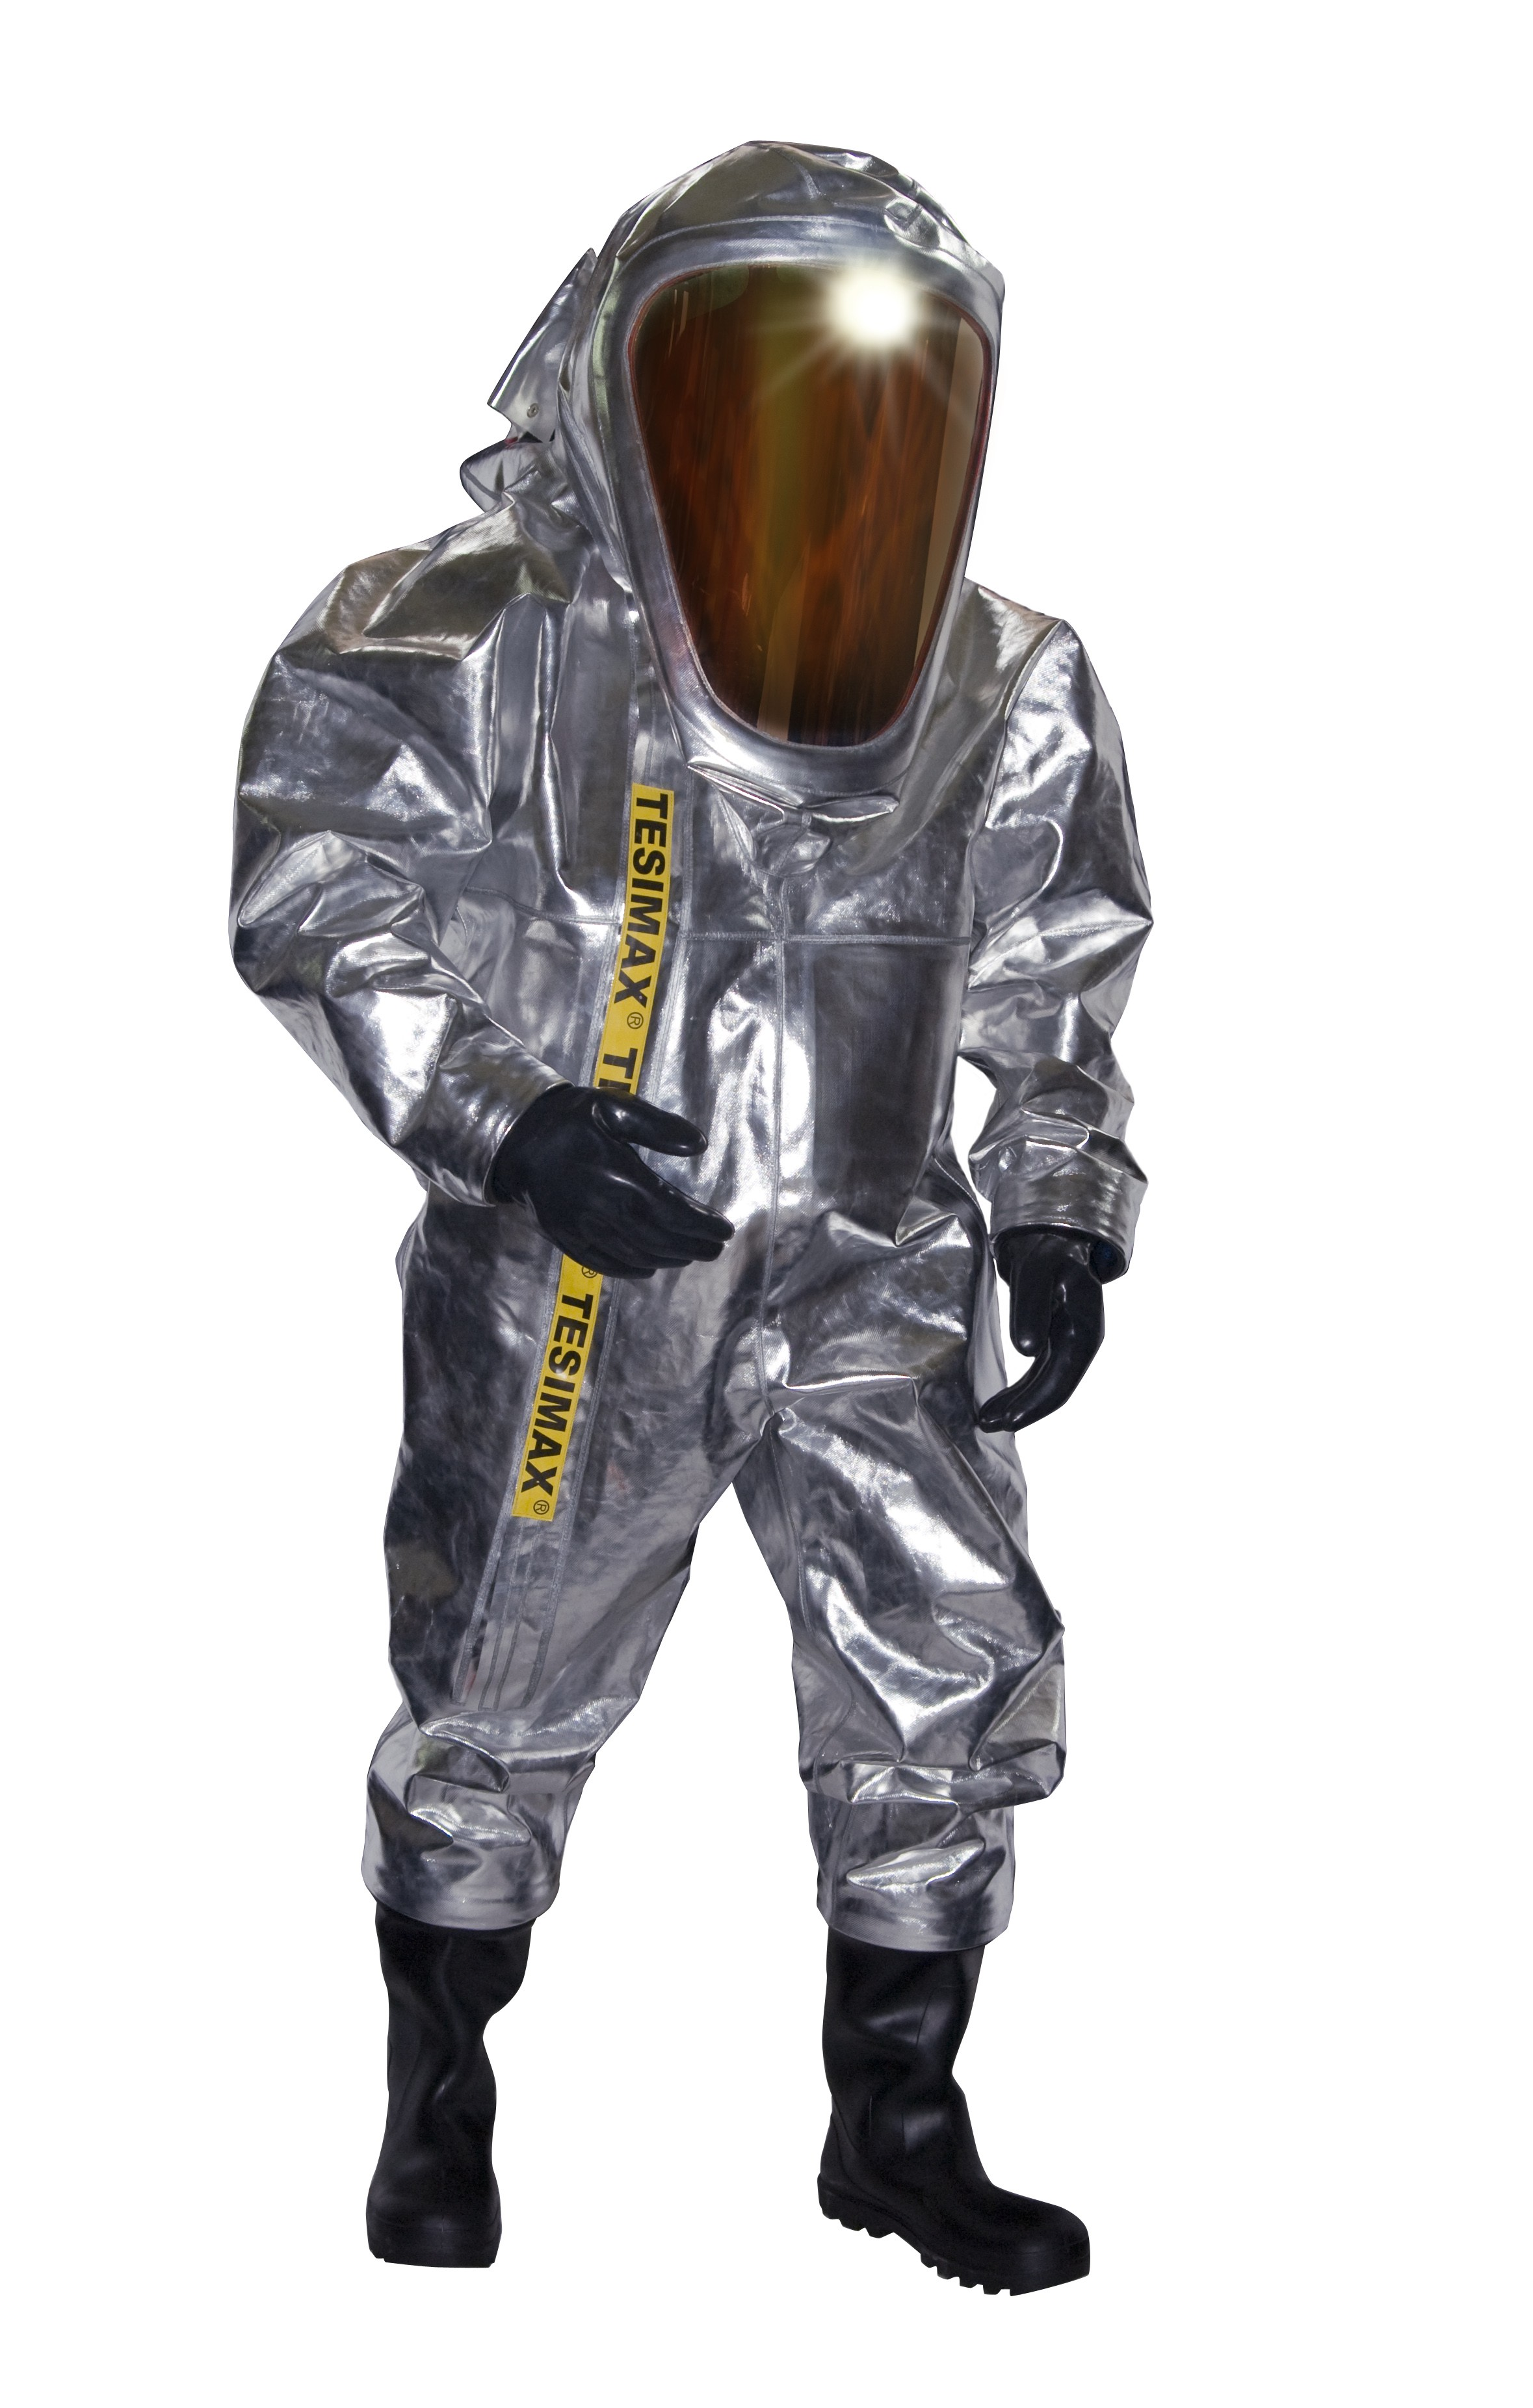 Fato Protecção Química SilverFlash